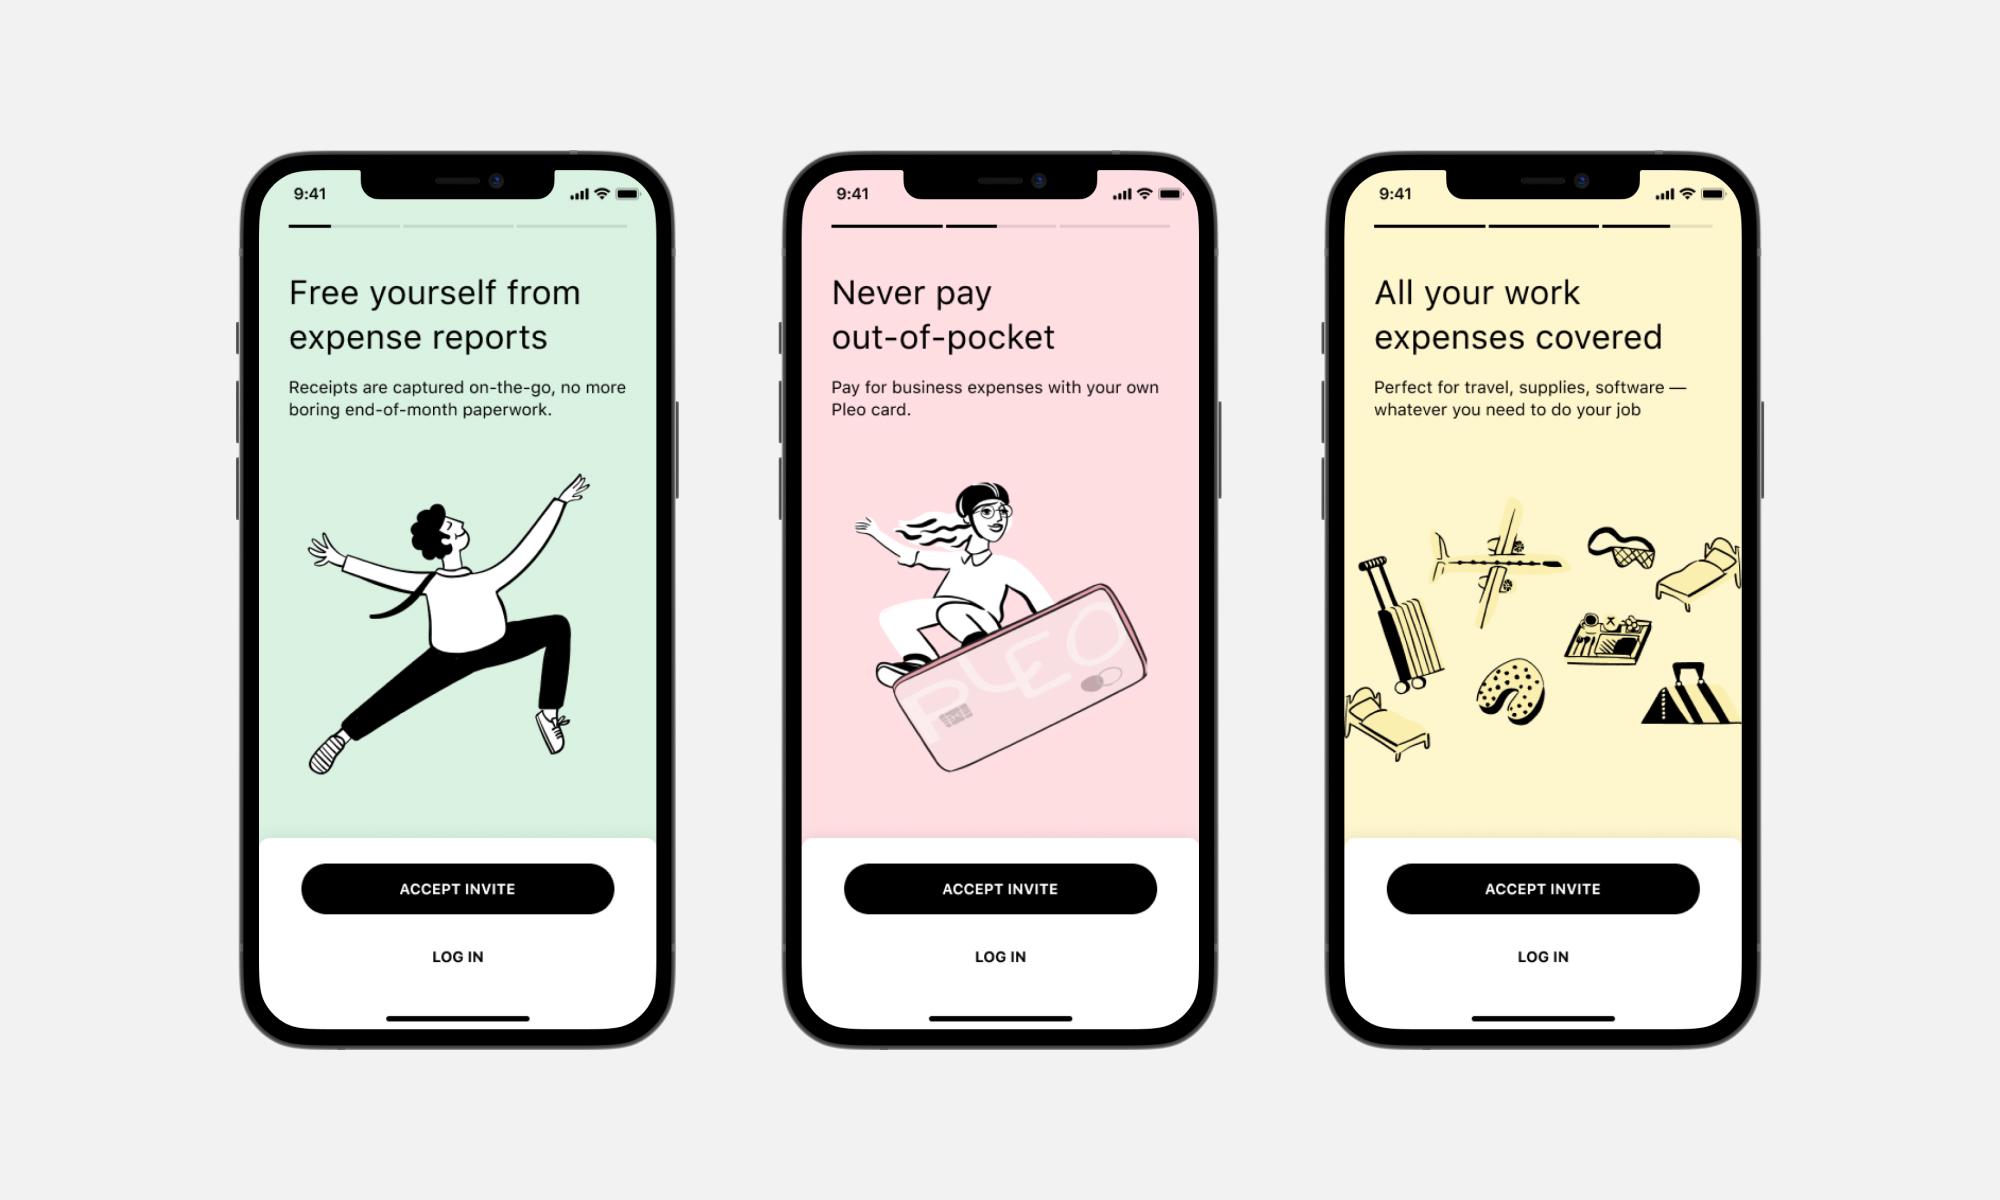 App introduction screens